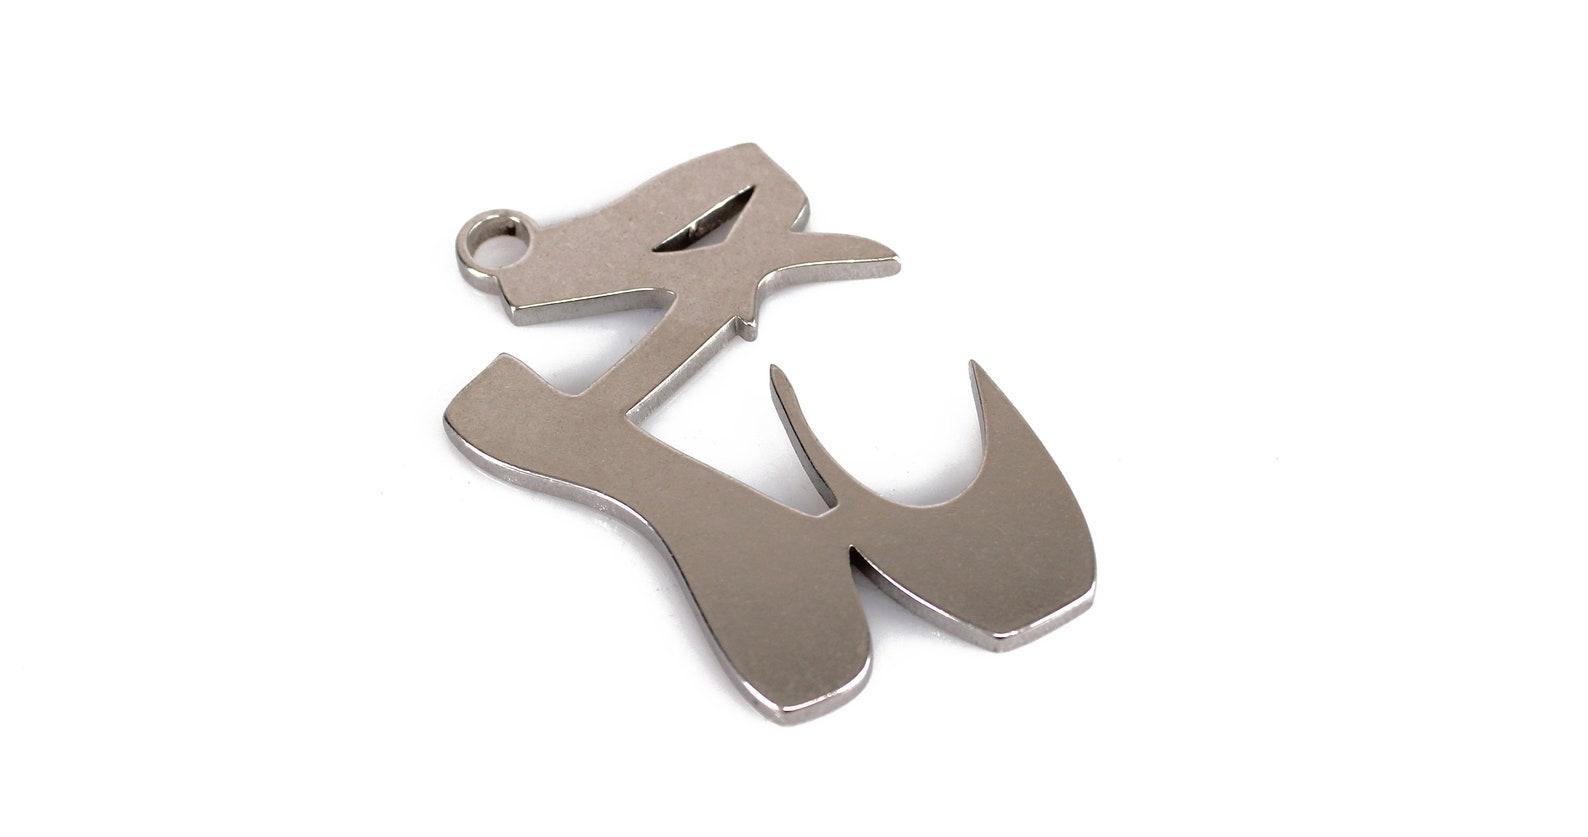 ballet shoes keychain porte-clés schlüsselanhänger gift dancing